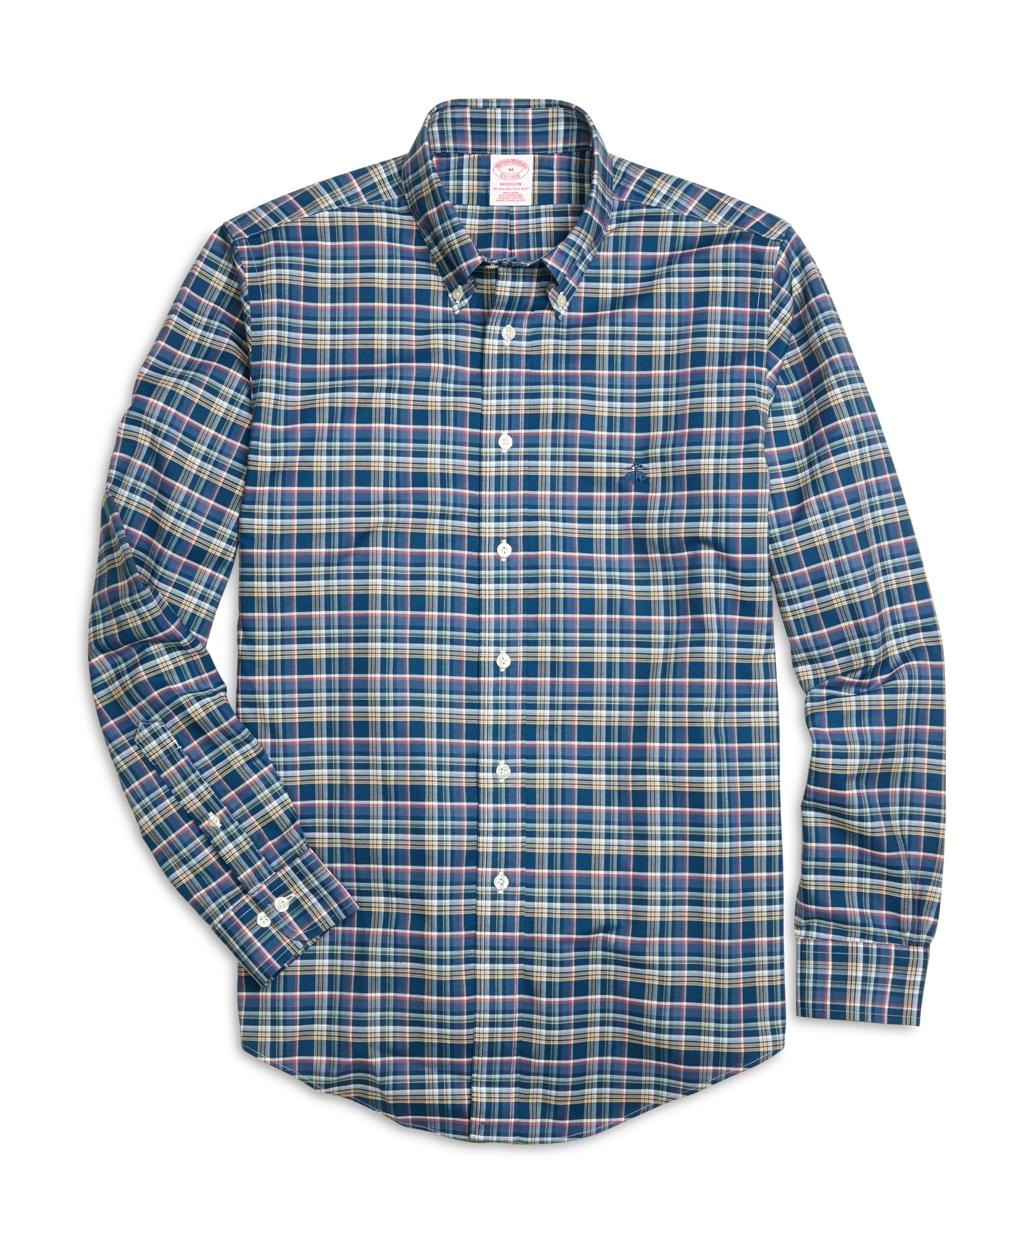 Brooks brothers non iron milano fit multiplaid sport shirt for Brooks brothers non iron shirts review